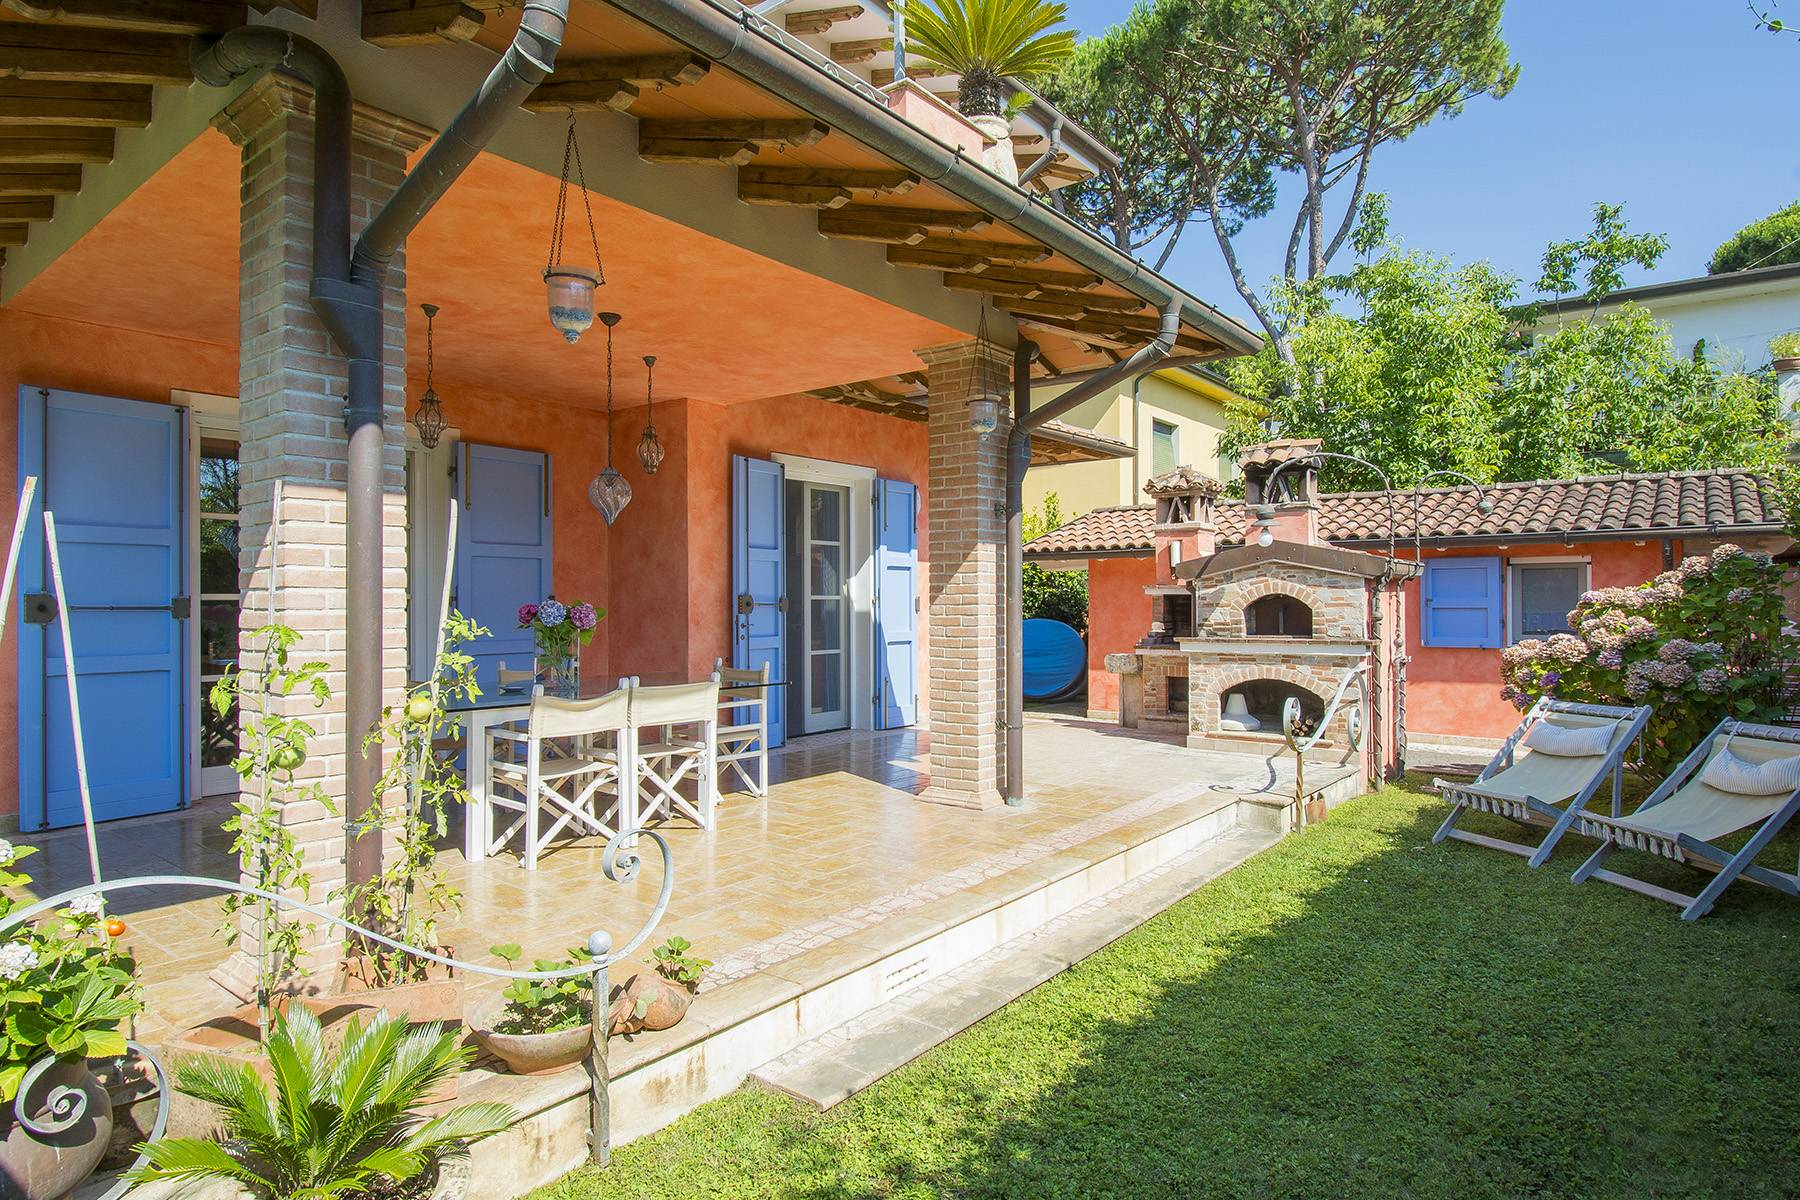 Casa indipendente in Vendita a Pietrasanta via umberto maddalena